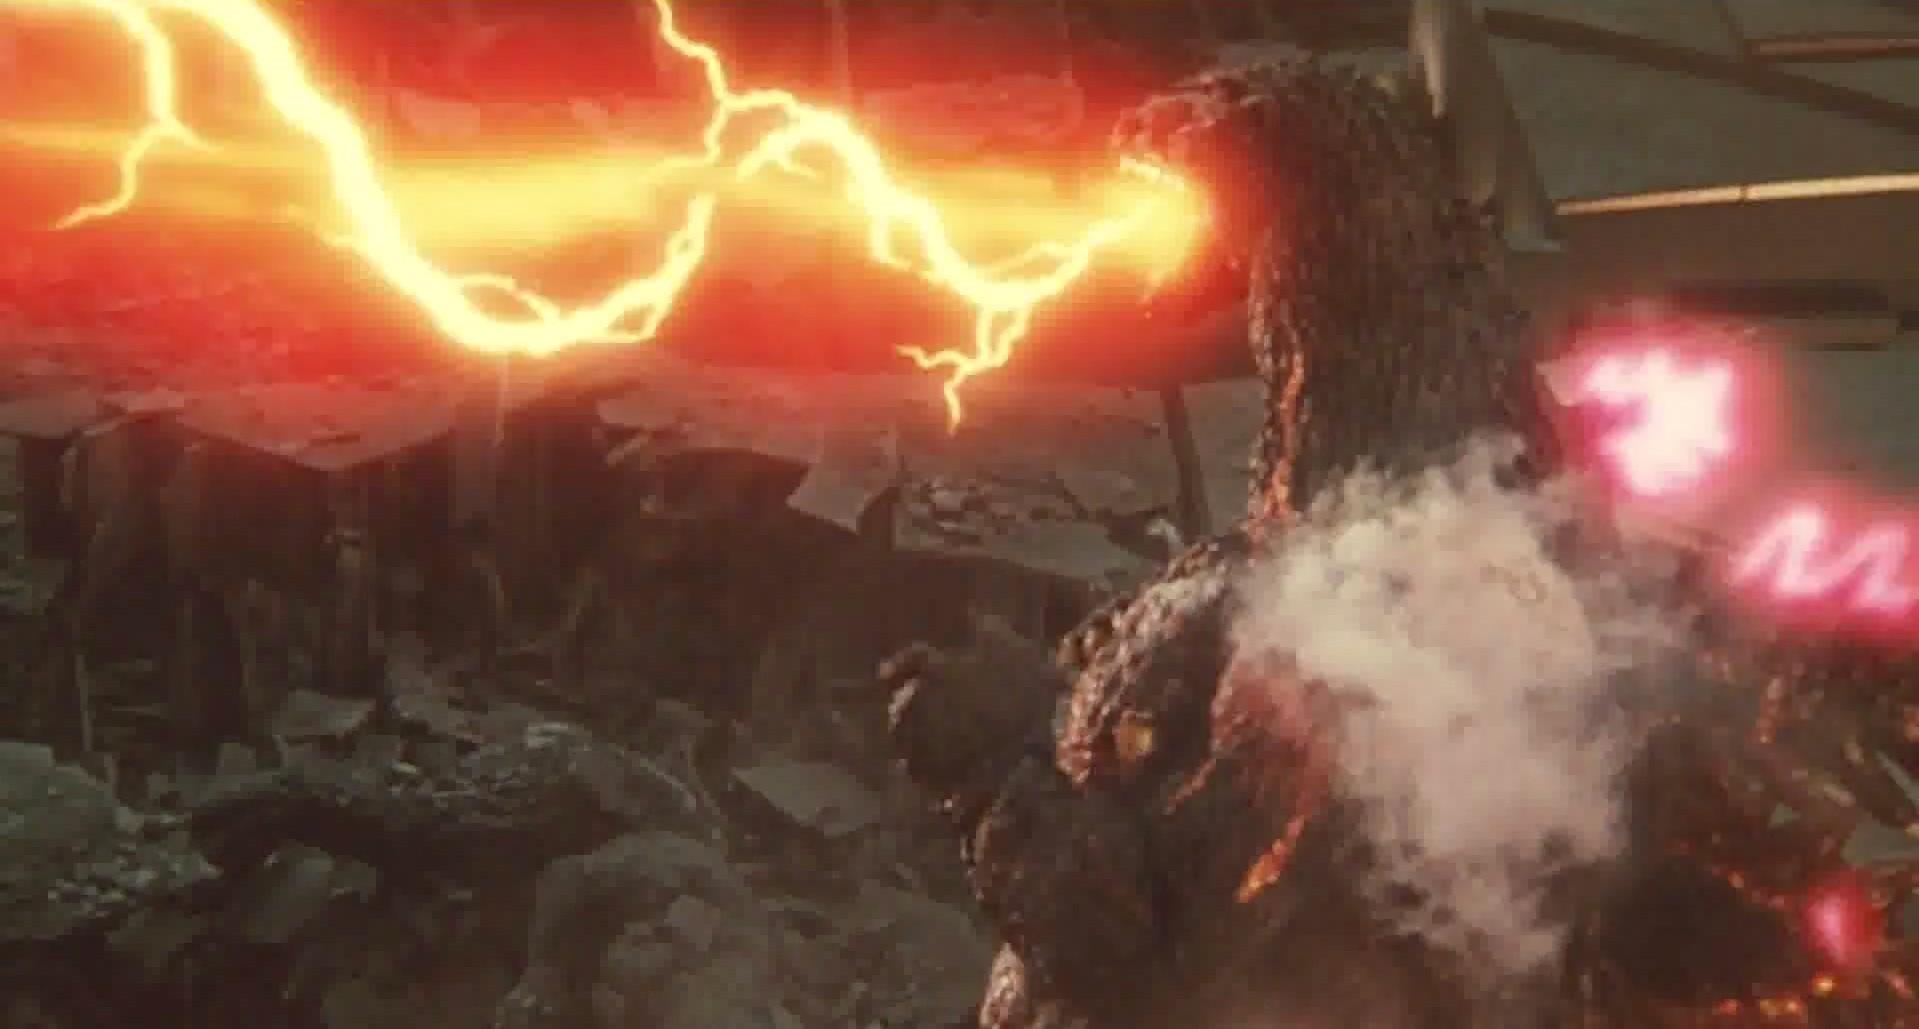 Godzilla Vs Destoroyah Wallpapers HD Download 1919x1029